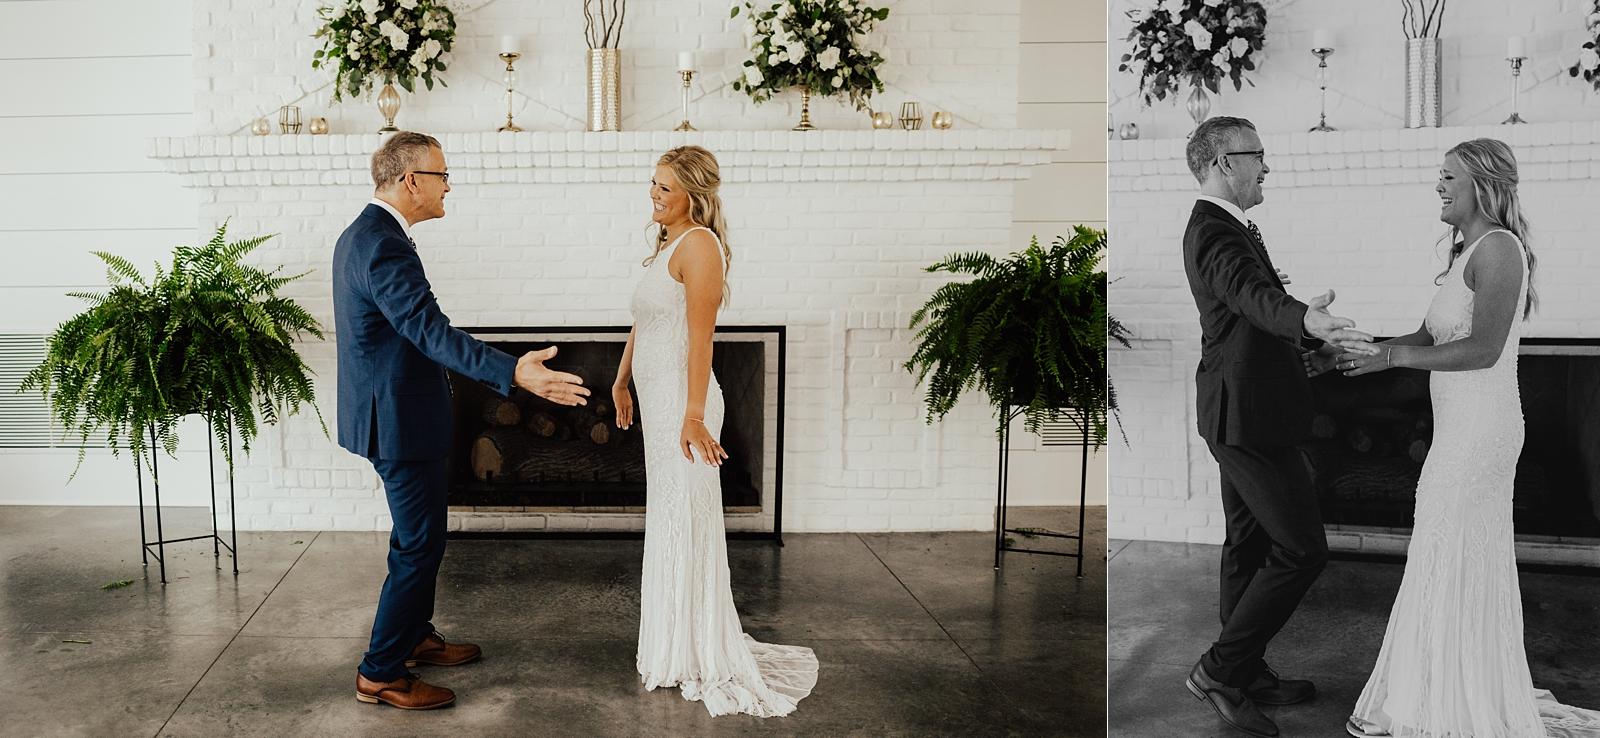 Anna & Trey Modern Minneapolis Wedding at The Hutton House_0694.jpg